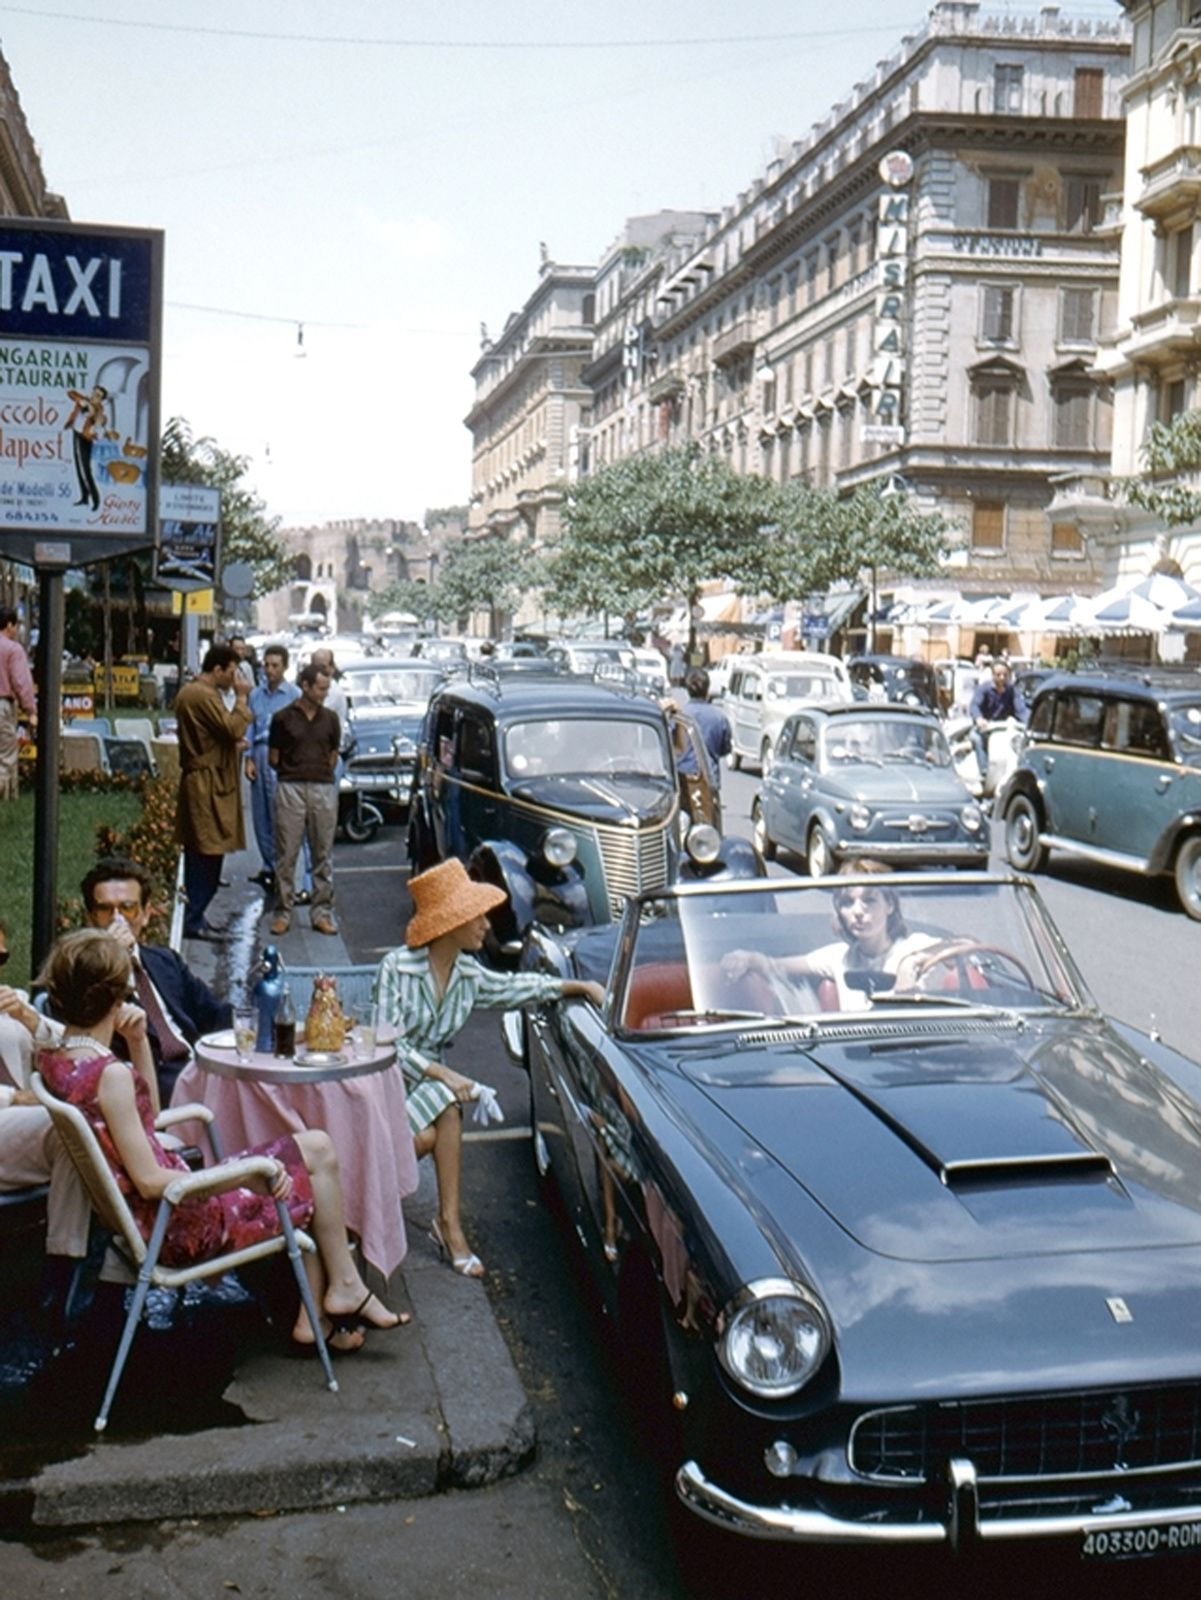 """ Des scènes de la vie quotidienne, Rome"", 1960 - Courtesy Studio Willy Rizzo"